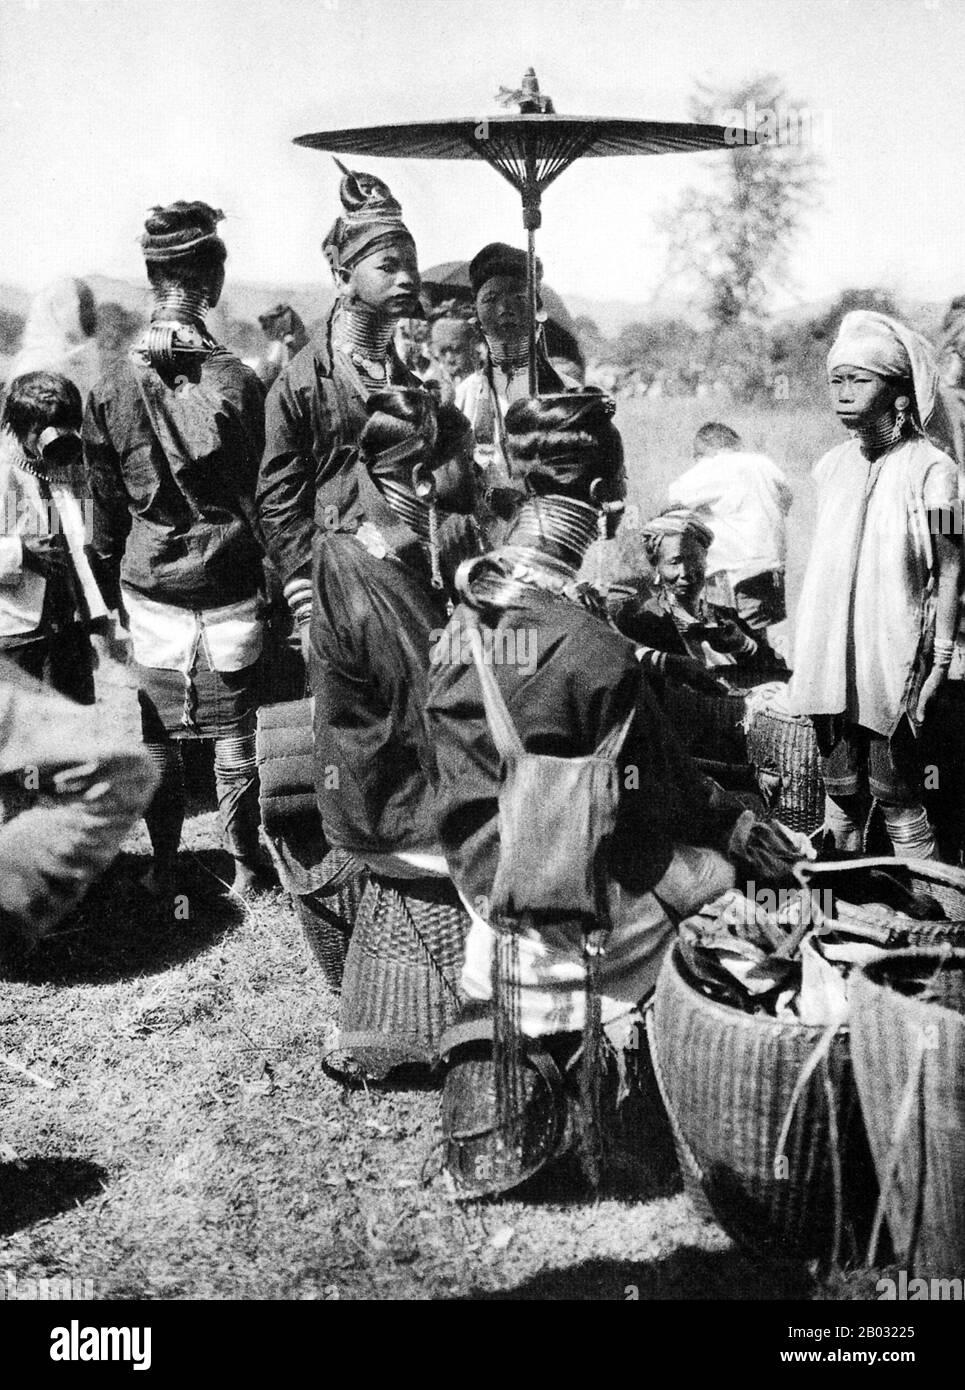 The Padaung or Kayan Lahwi or Long Necked Karen are a subgroup of the Kayan, a mix of Lawi, Kayan and several other tribes. Kayan are a subgroup of the Red Karen (Karenni) people, a Tibeto-Burman ethnic minority of Burma (Myanmar). Stock Photo